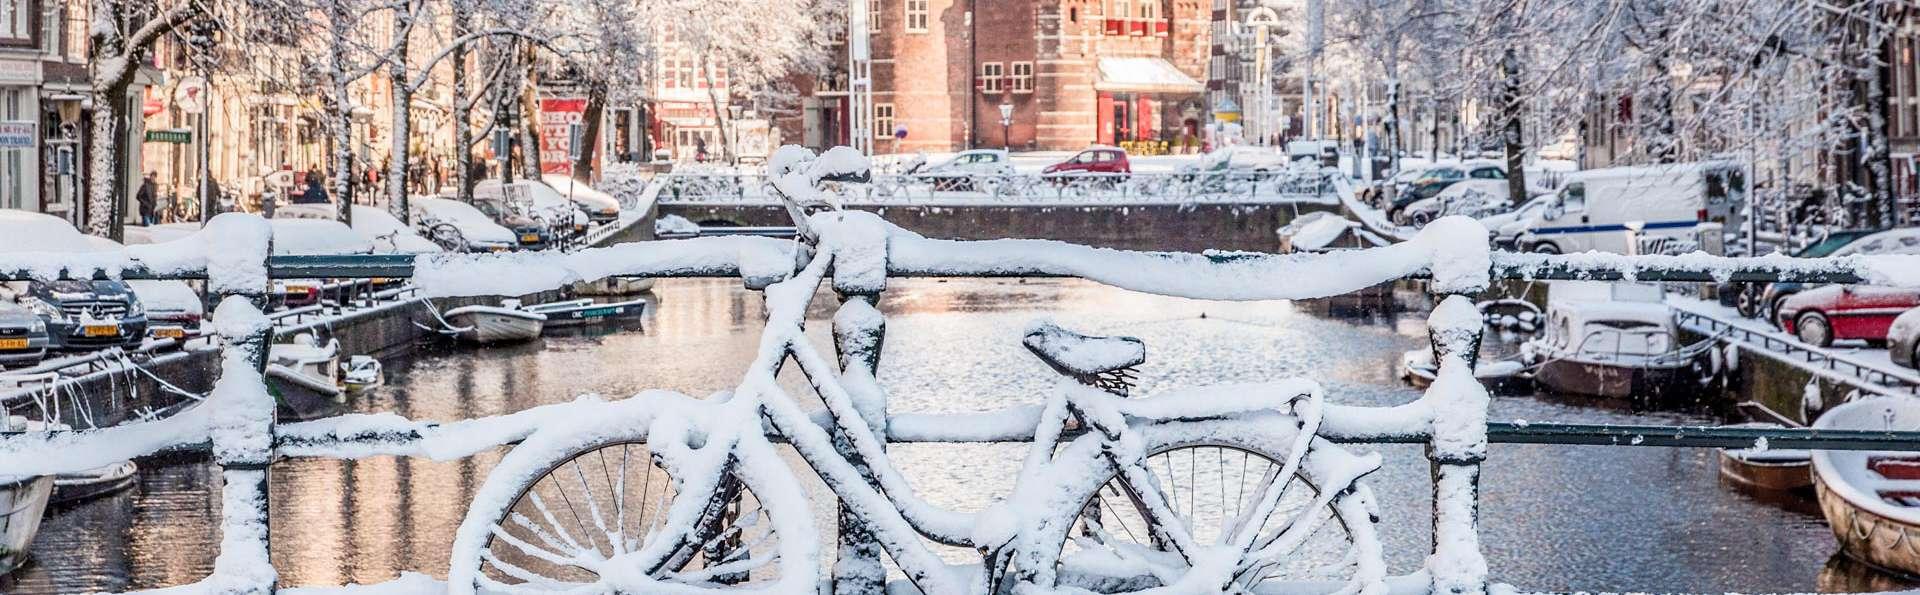 Swissôtel Amsterdam - EDIT_AMSTERDAM_44.jpg